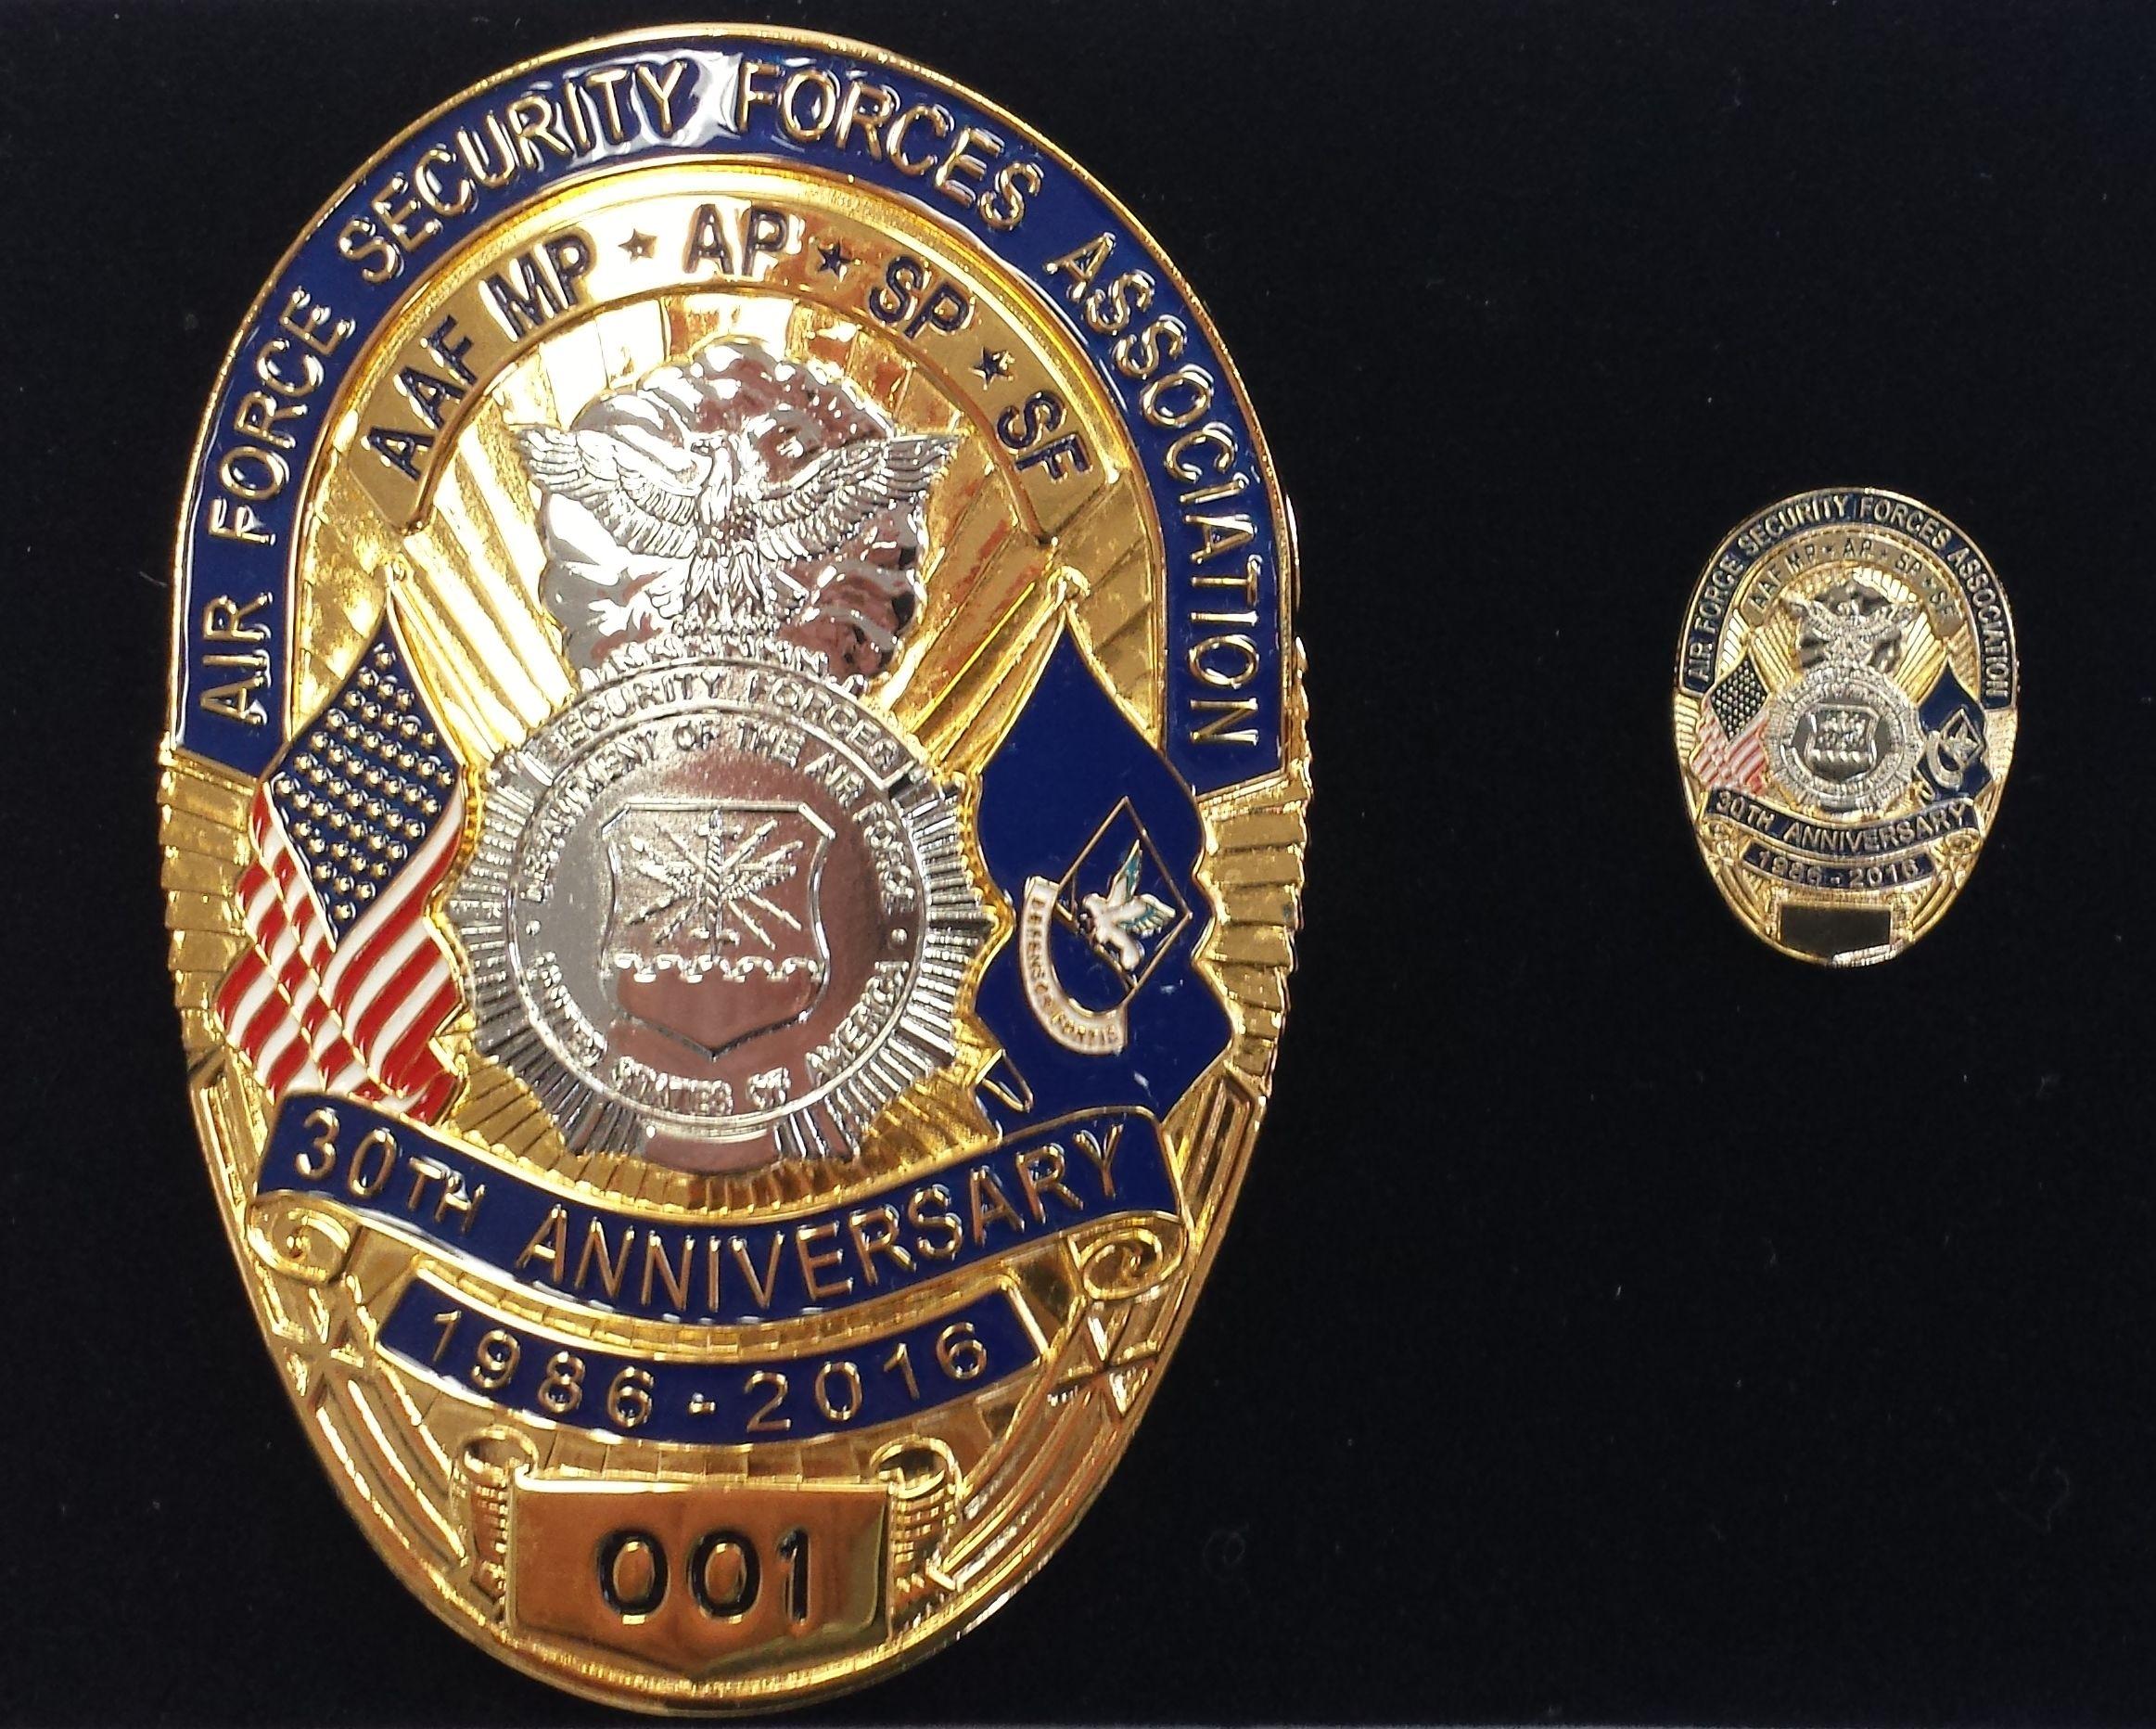 Anniversary Commemorative Badge That Include Lapel Pin Usaf Badge Lapel Pins